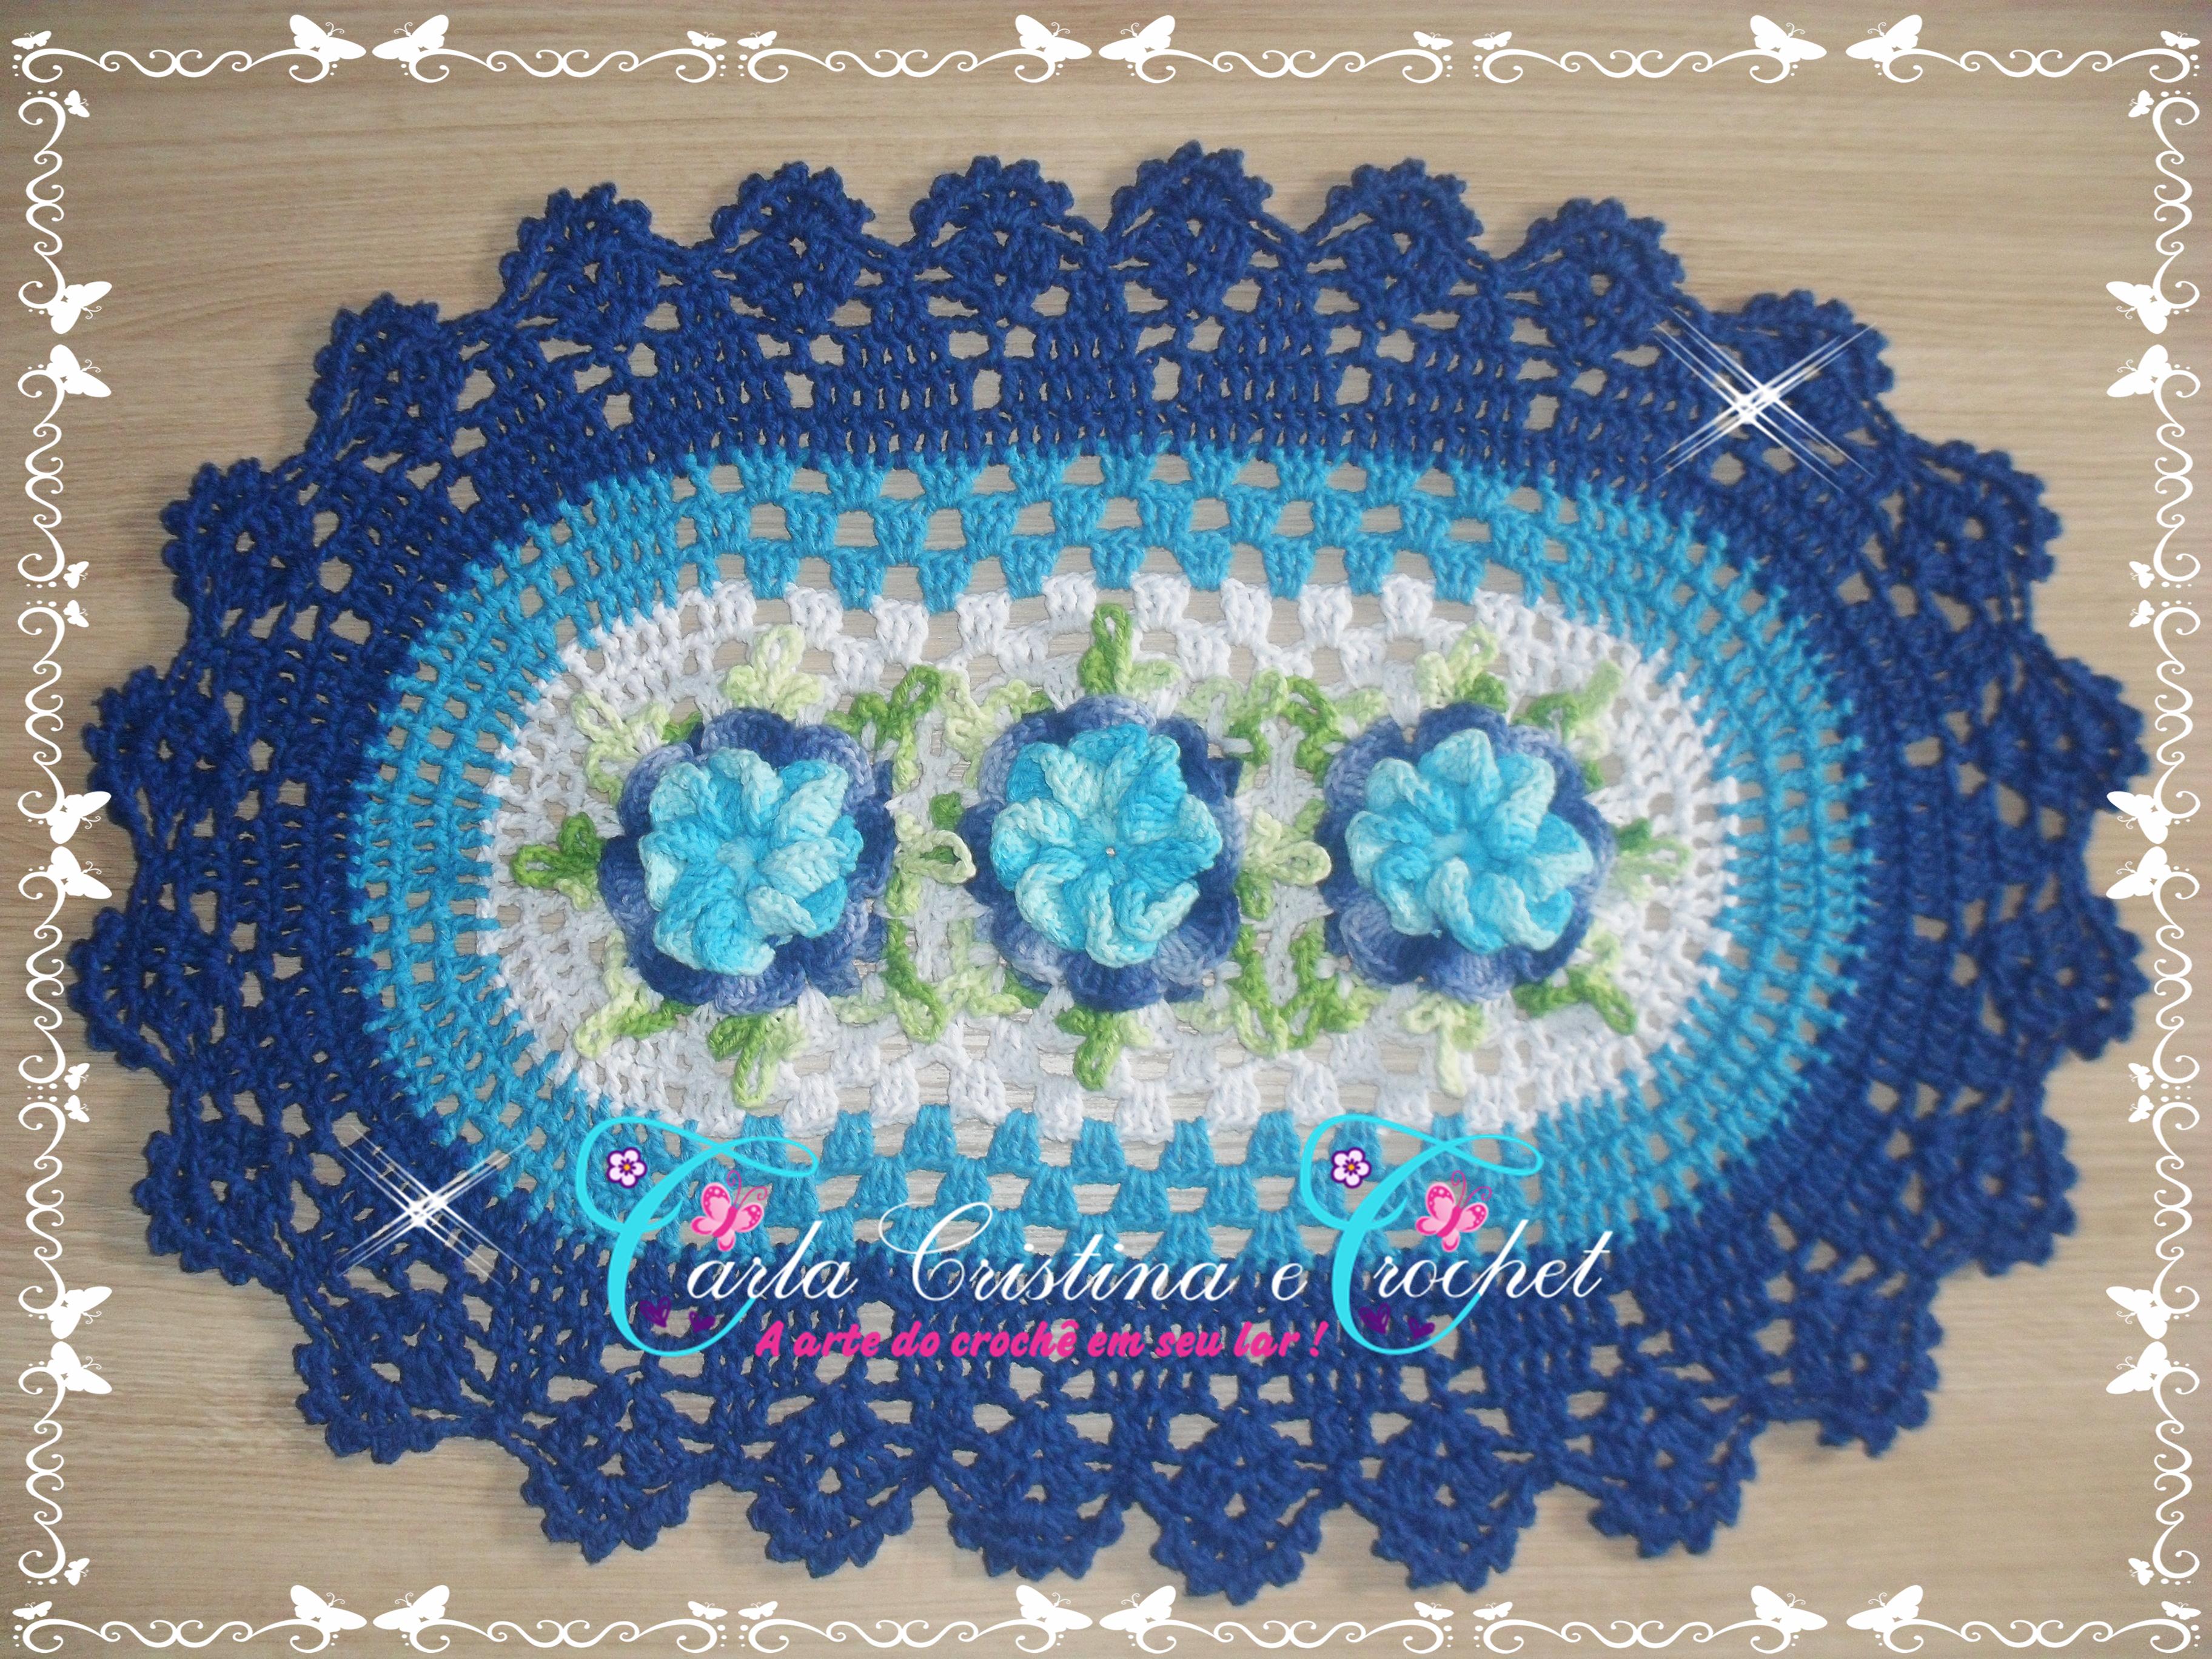 Tapete em Barbante Flor Caracol Azul carla cristina e crochet Elo7 #218EAA 3648x2736 Banheiro Cor Azul